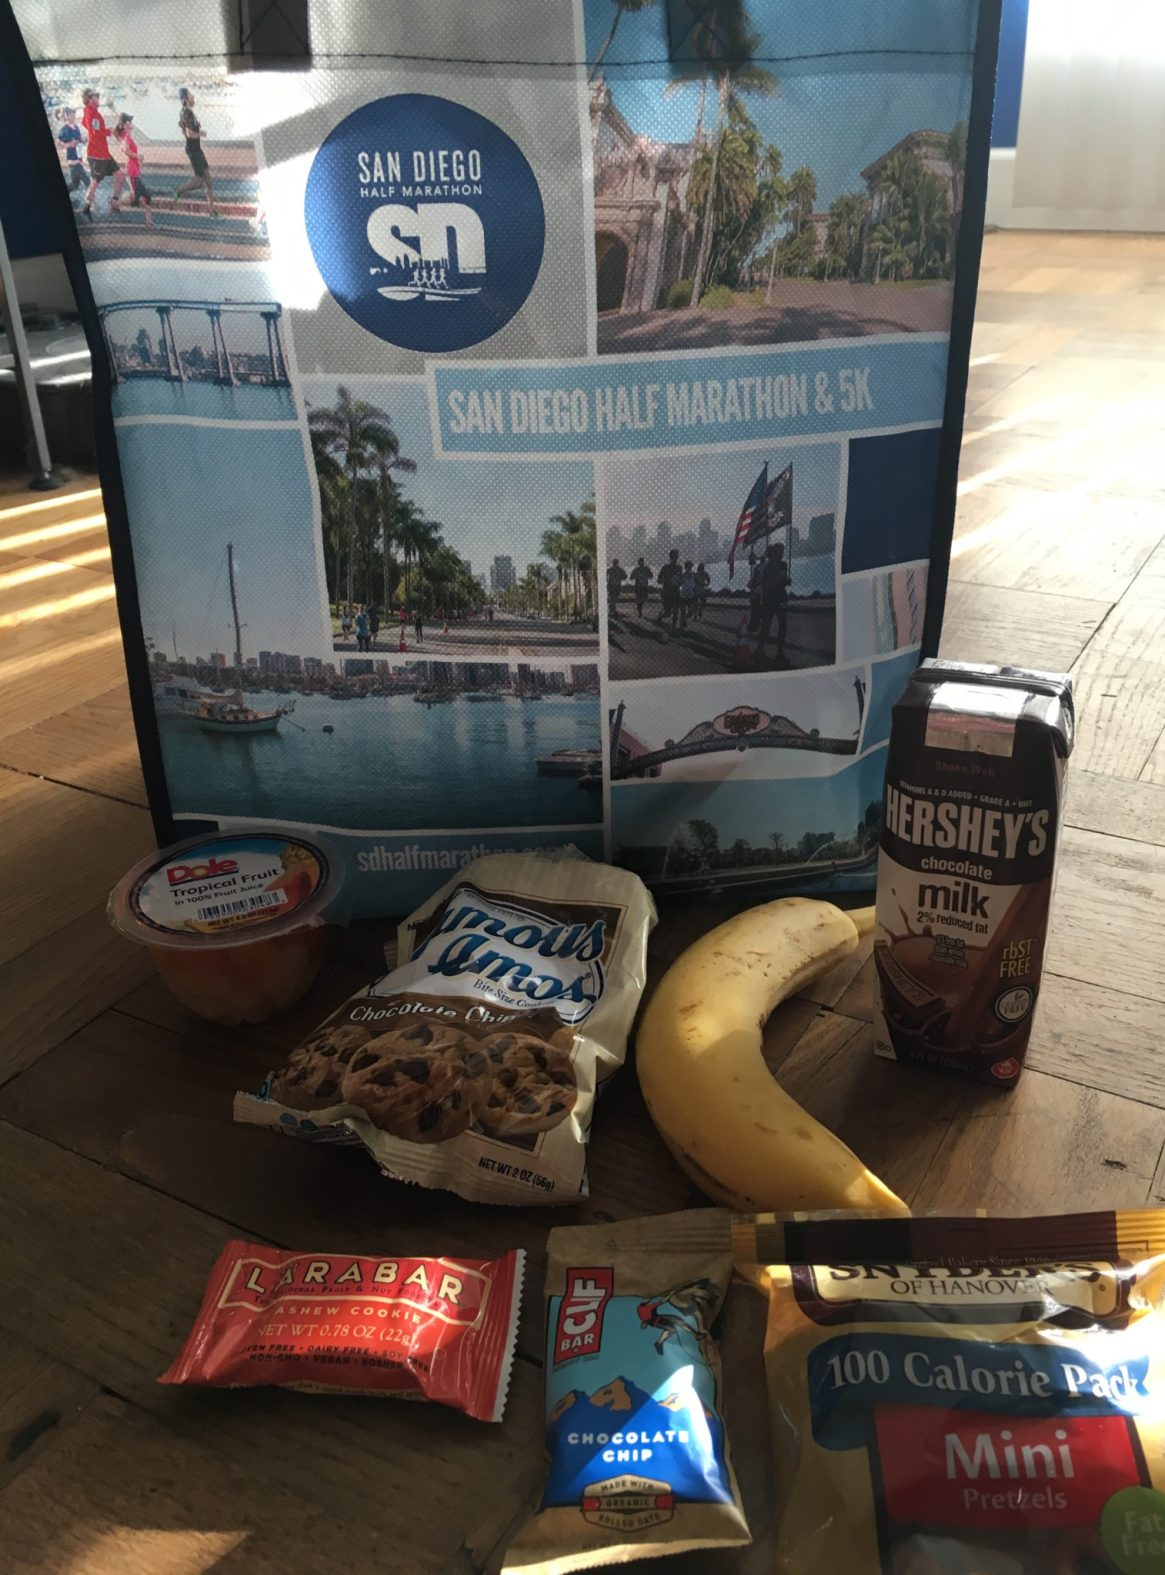 San Diego Half Marathon, Goodie Bag, Hershey's Chocolate Milk, Dole, Larabar, Clifbar